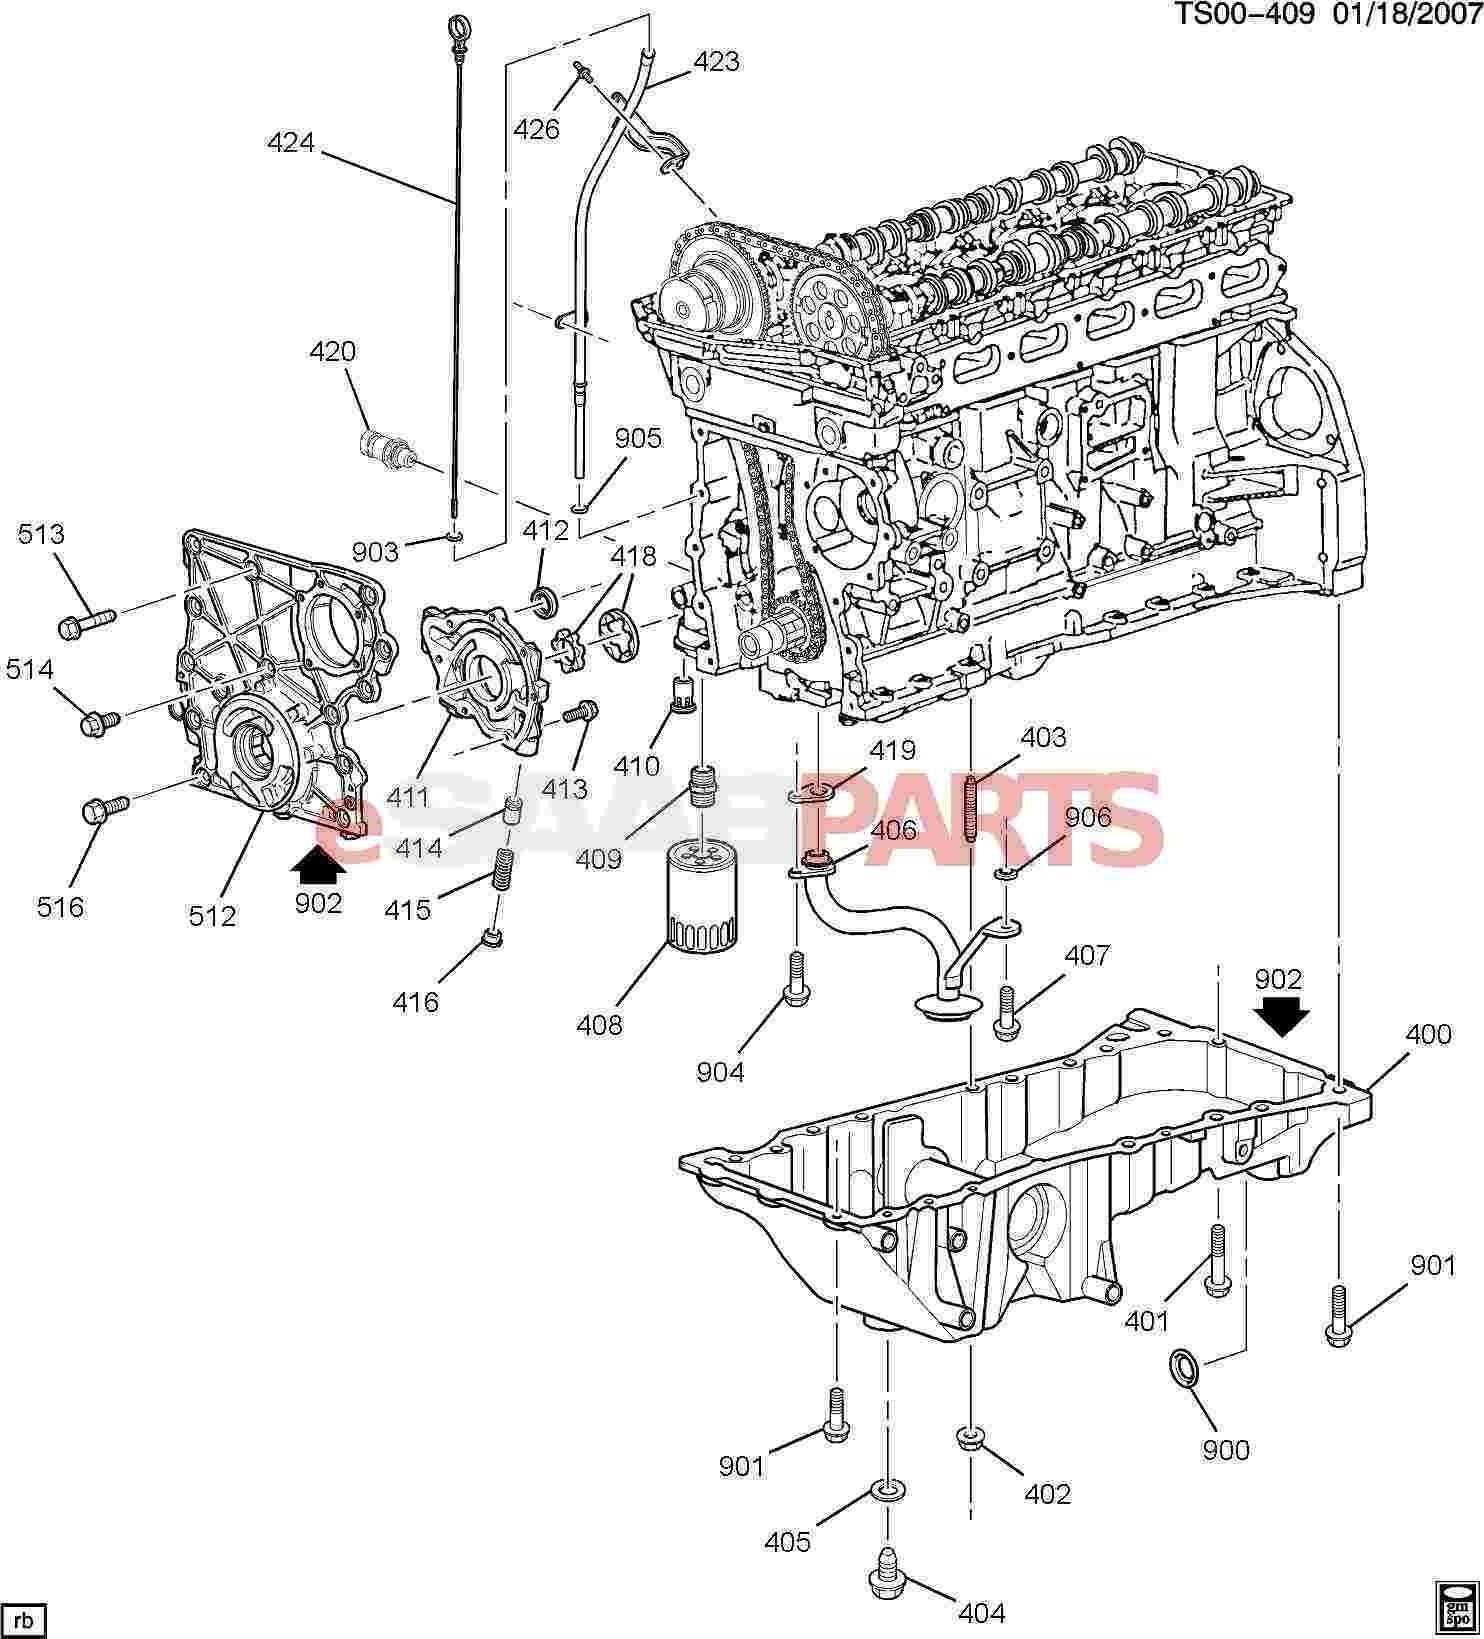 2002 chevy trailblazer engine diagram wiring for stratocaster my